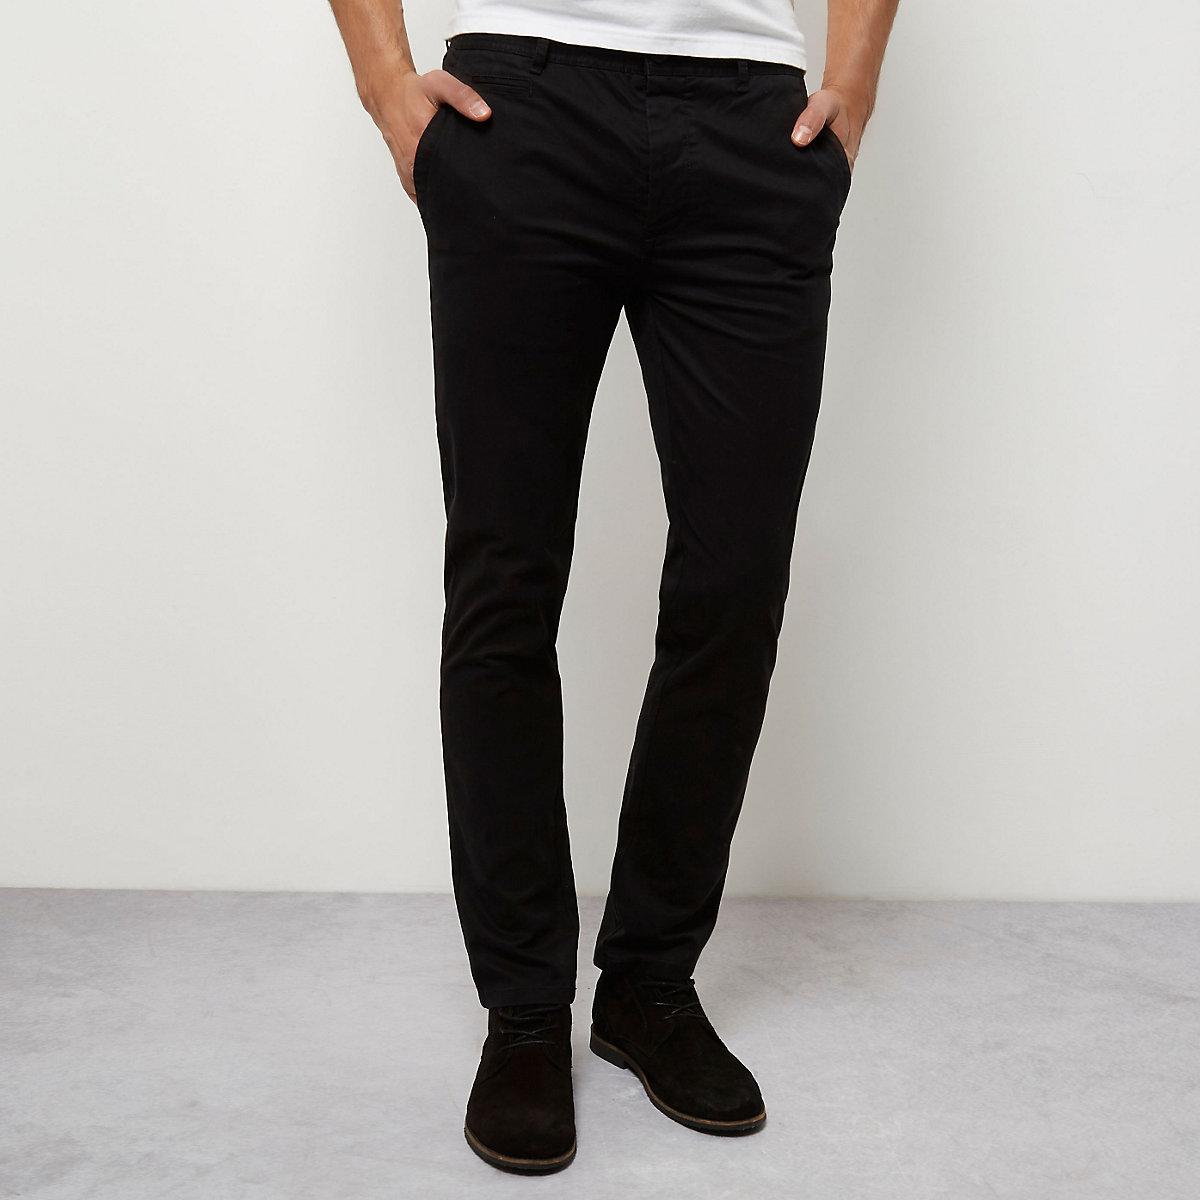 Pantalon chino skinny noir stretch